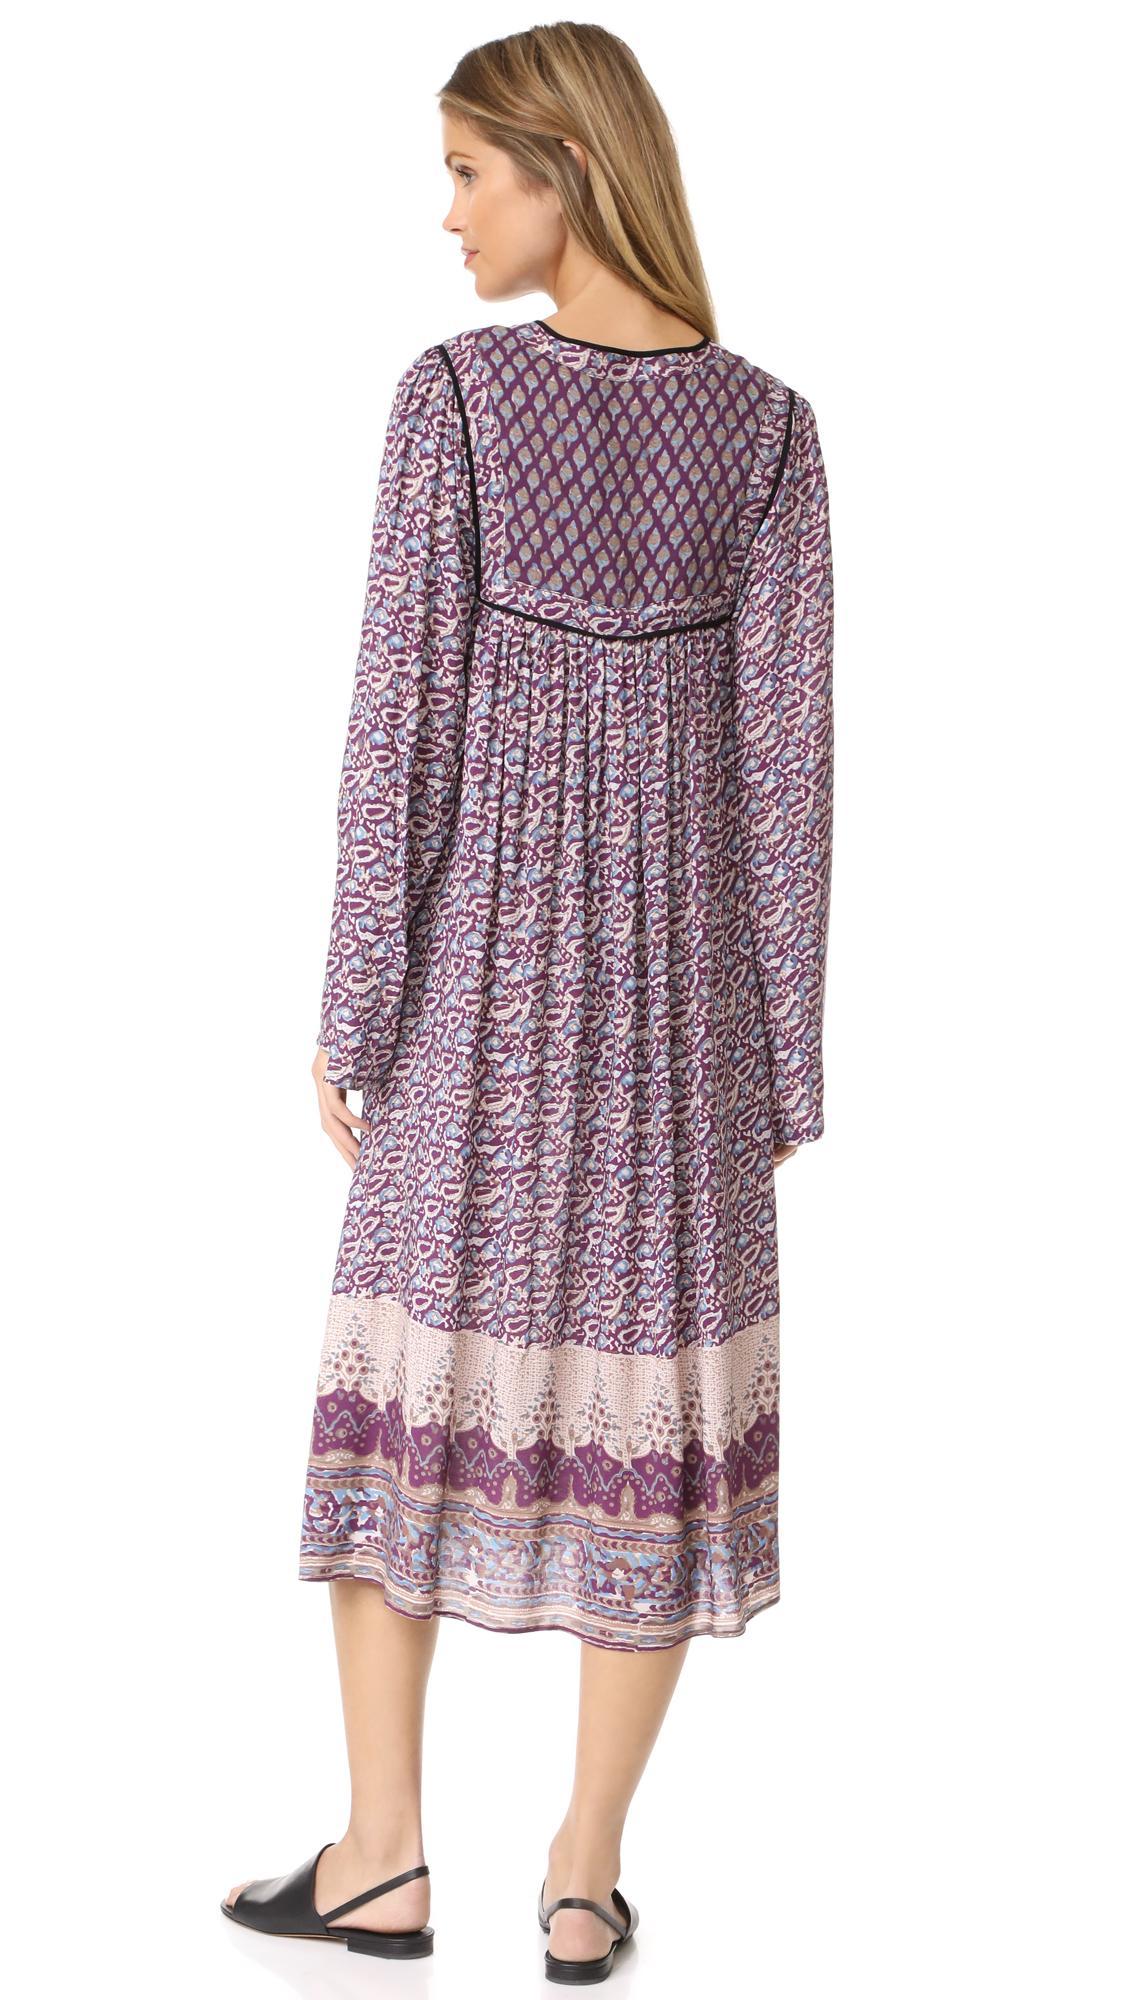 3f24d428fa61c Lyst - Nightcap Moonlight Boho Dress in Purple